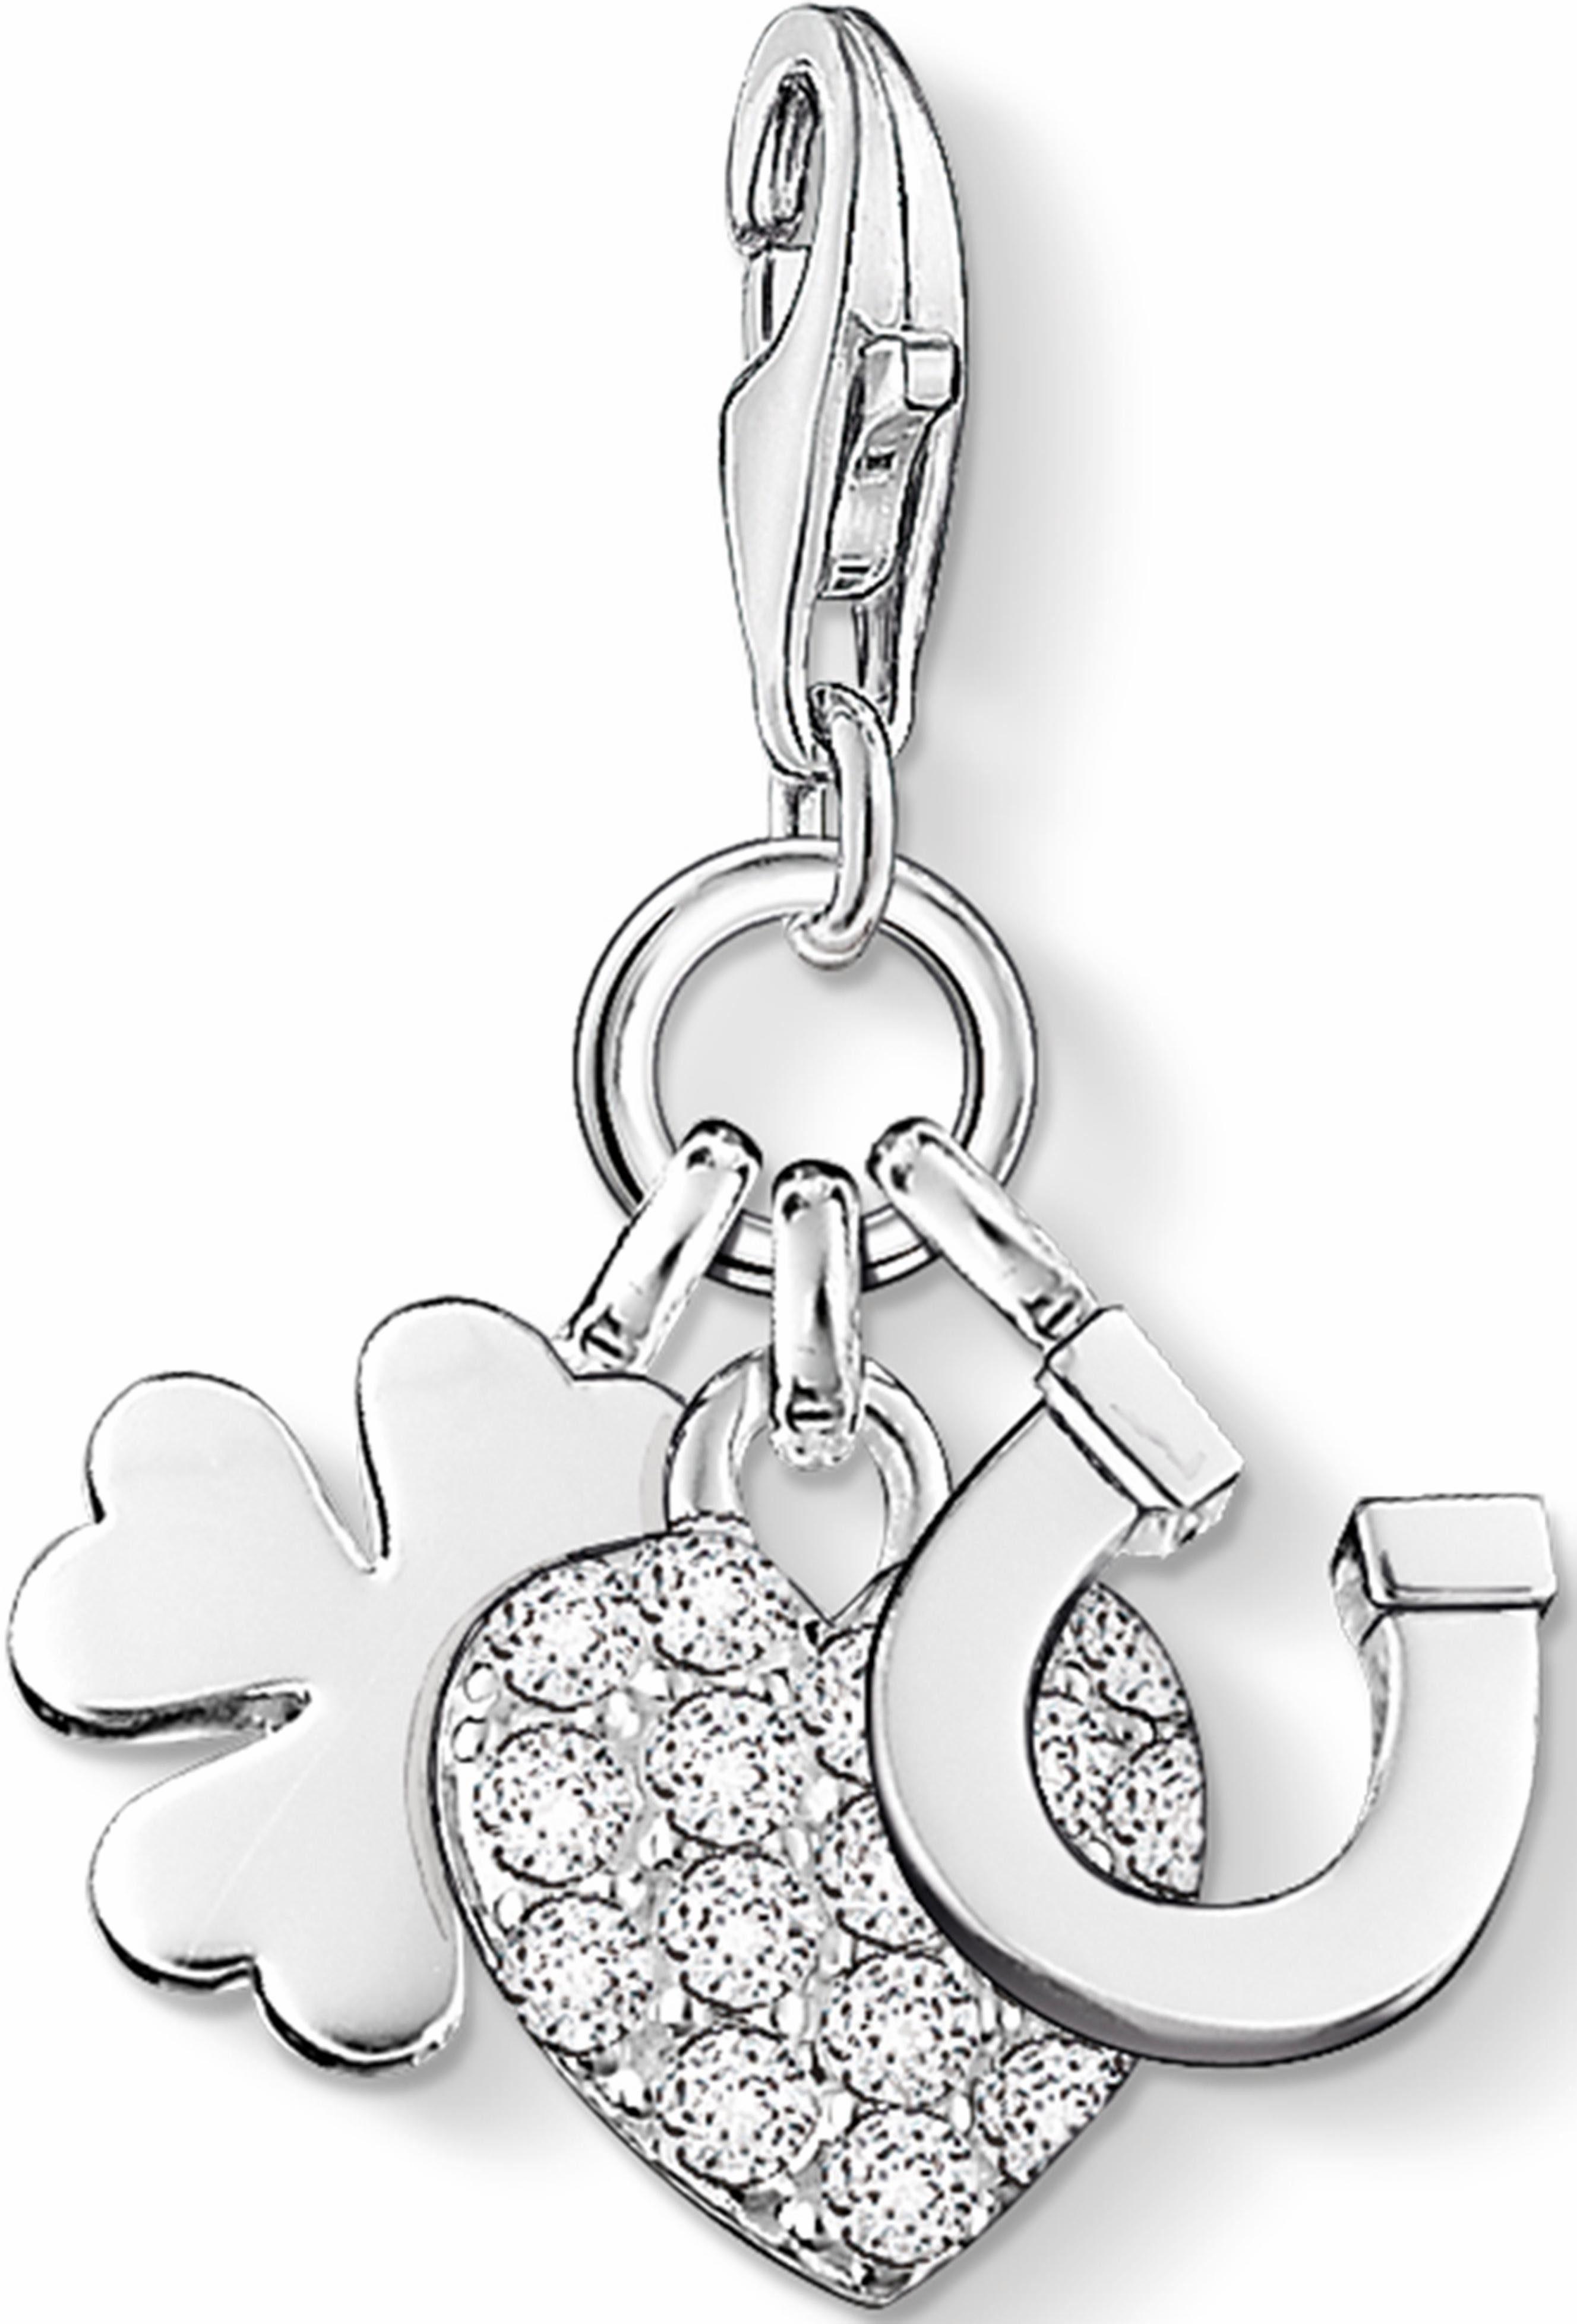 Thomas Sabo Charm-Einhänger »Lucky Charm, 0870-051-14« mit Zirkonia